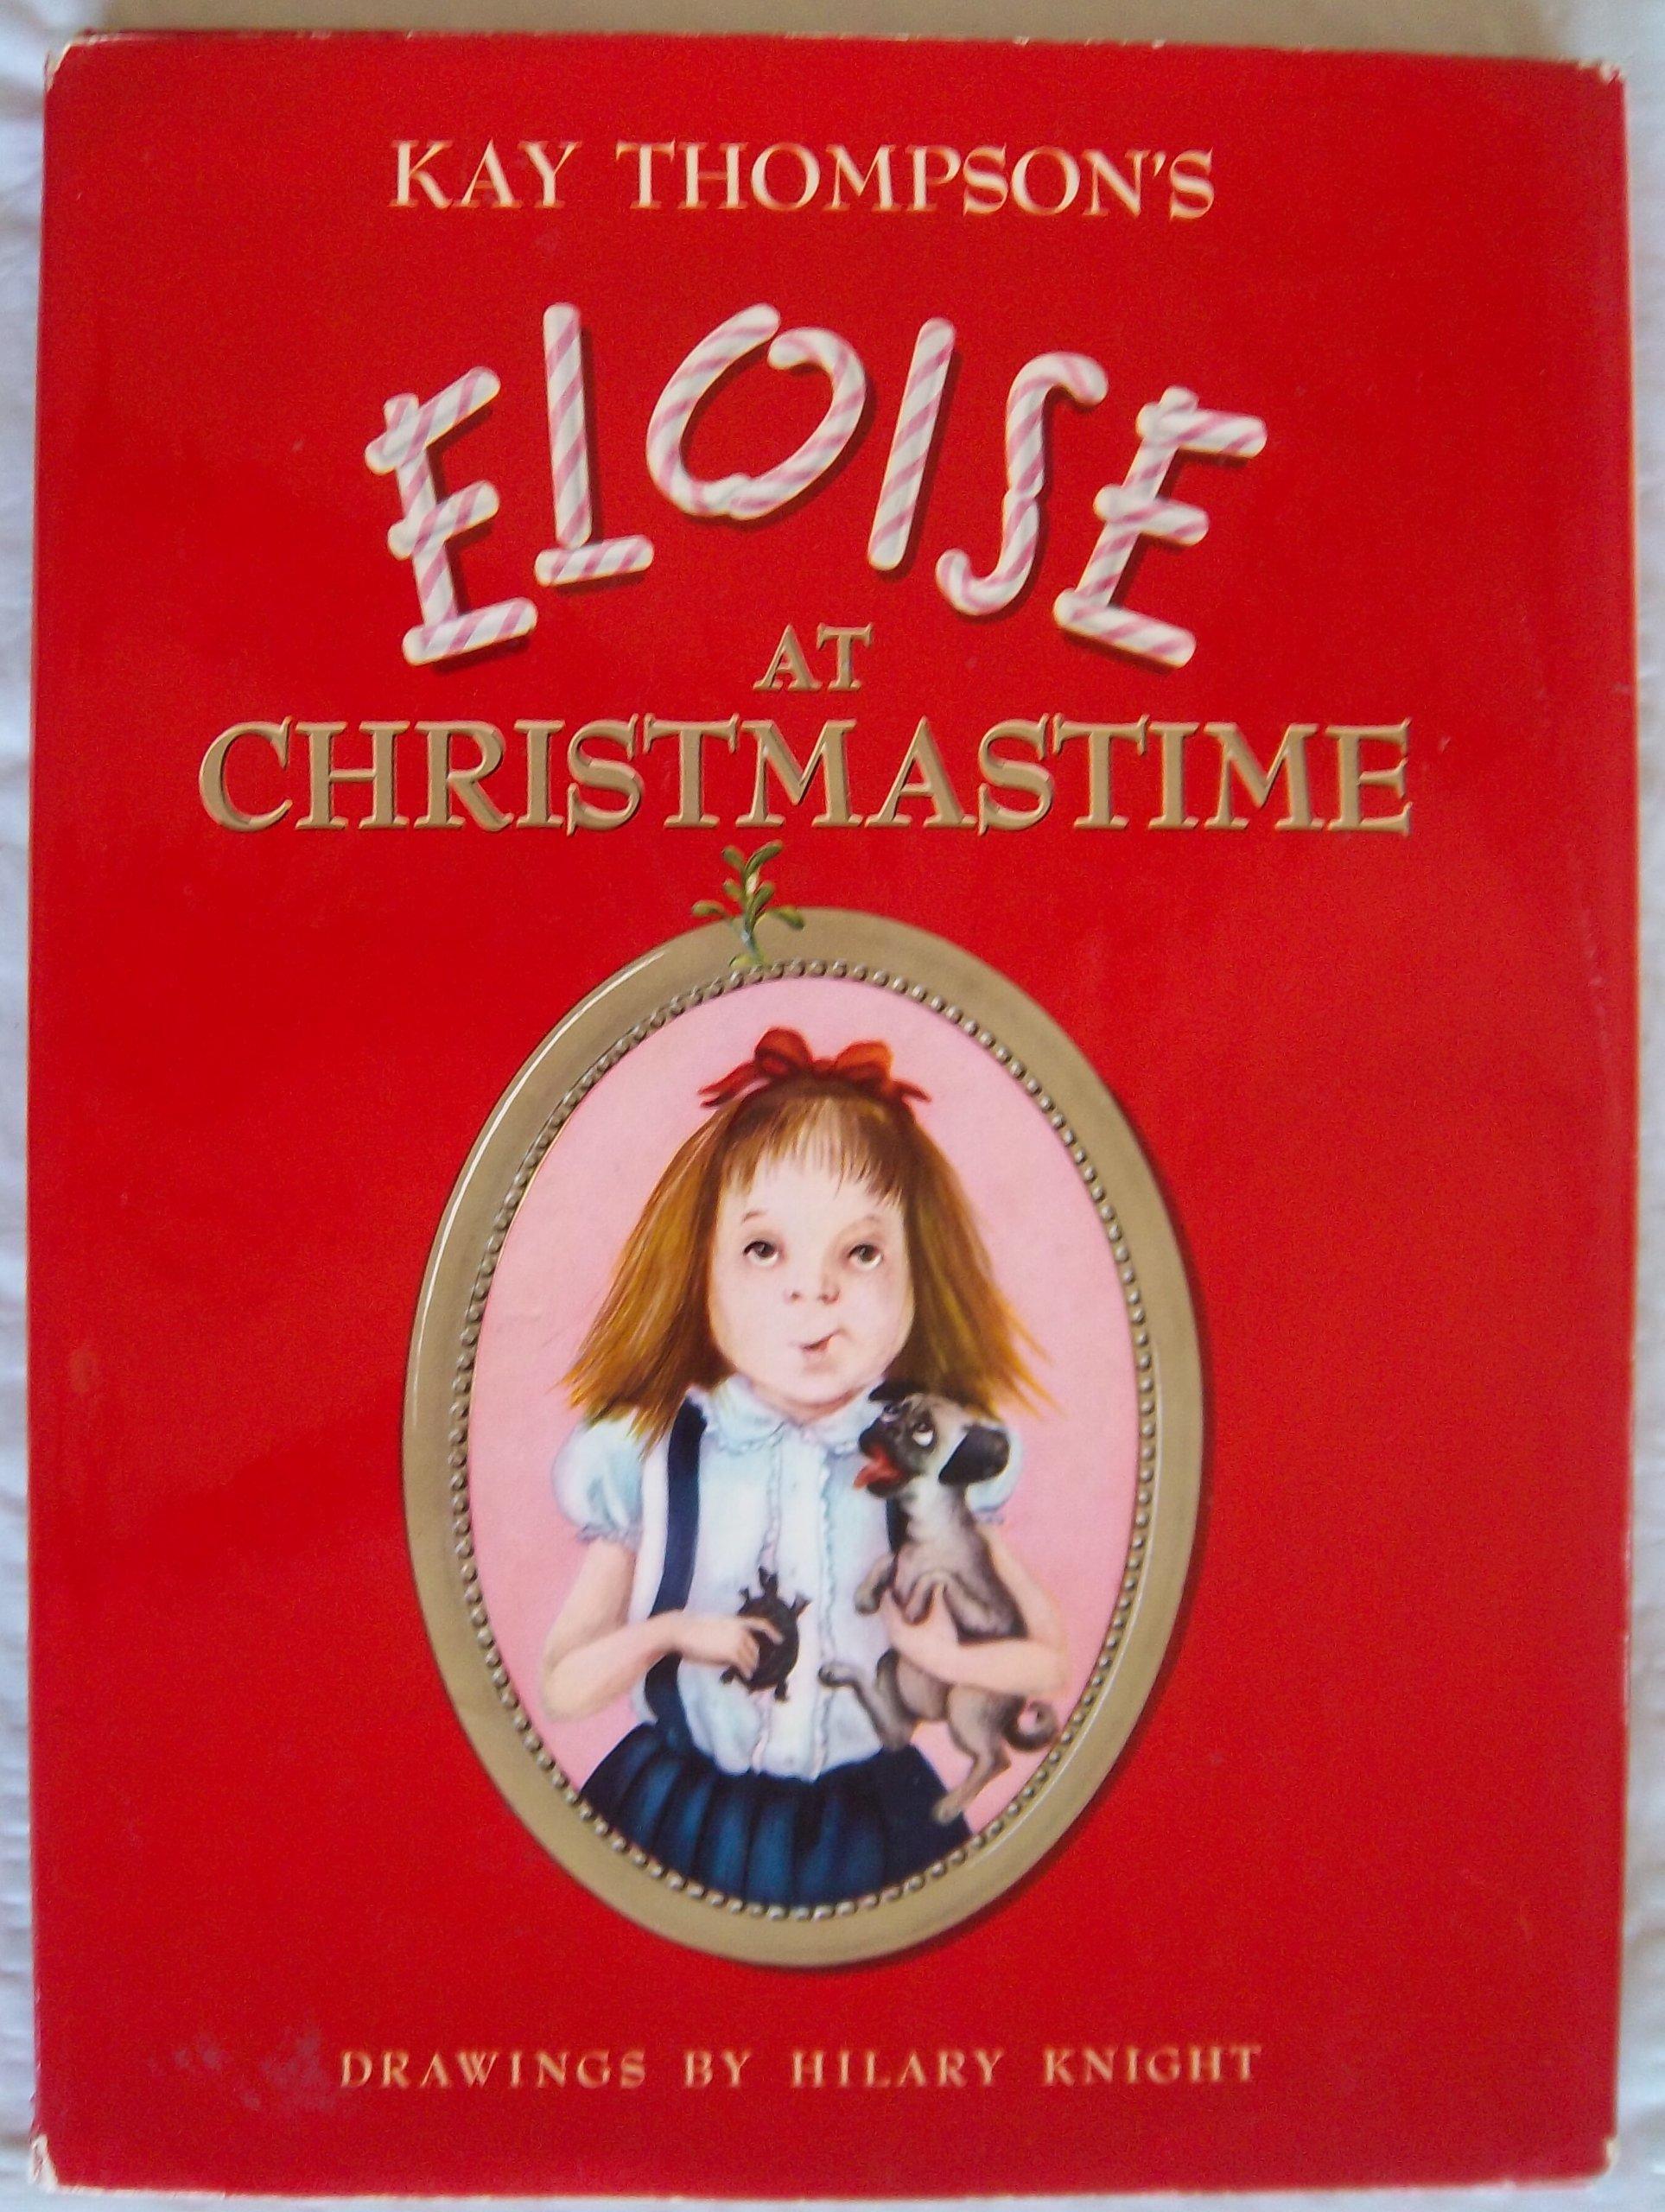 Eloise at Christmastime, Christmas Time: Kay Thompson ...